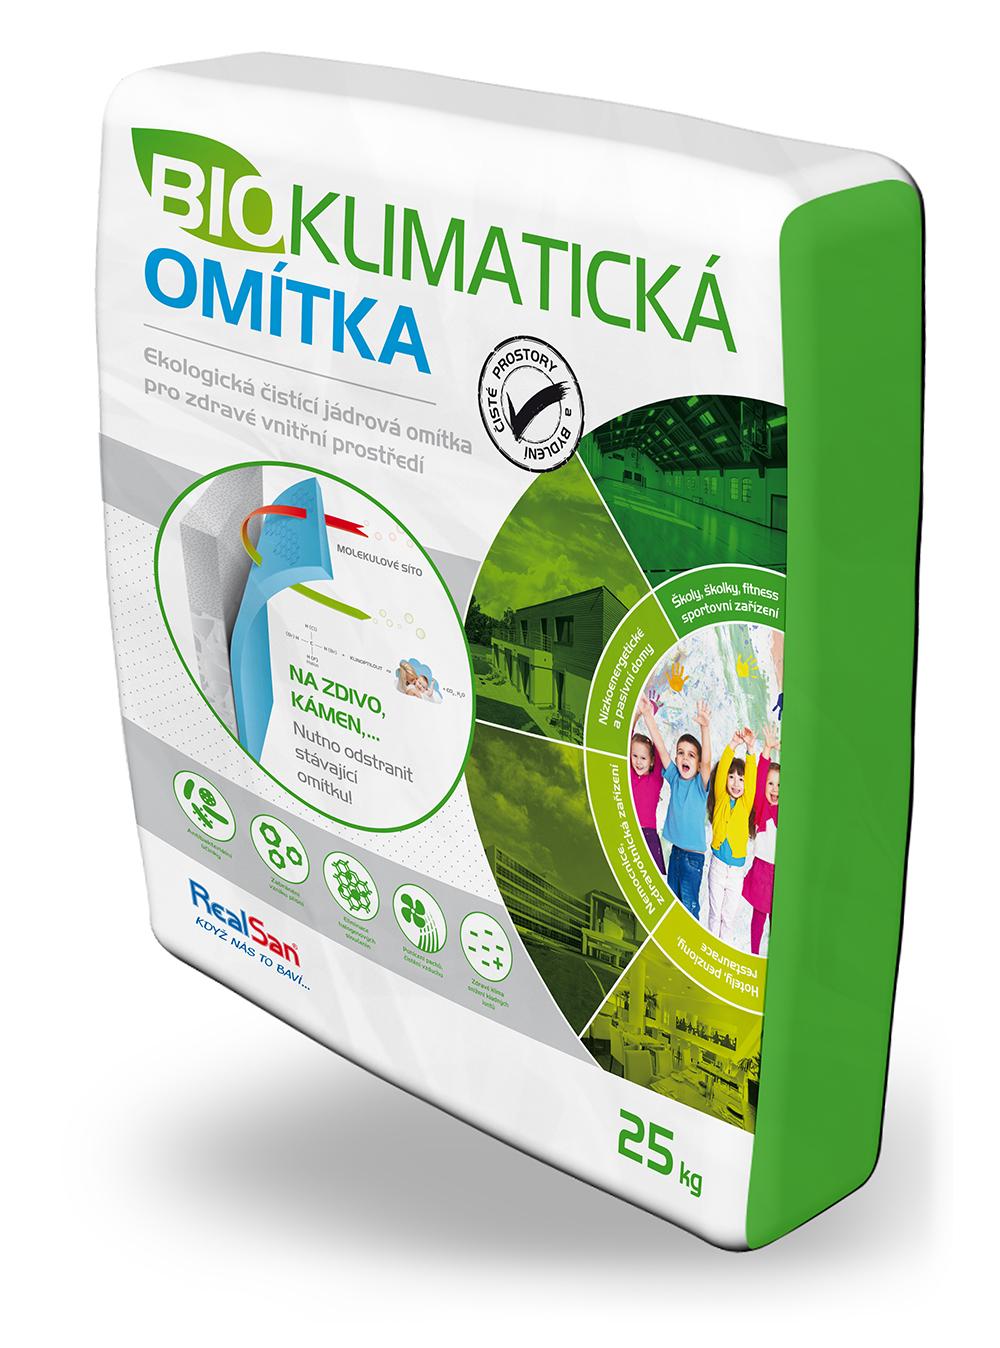 bioklimatická omítka